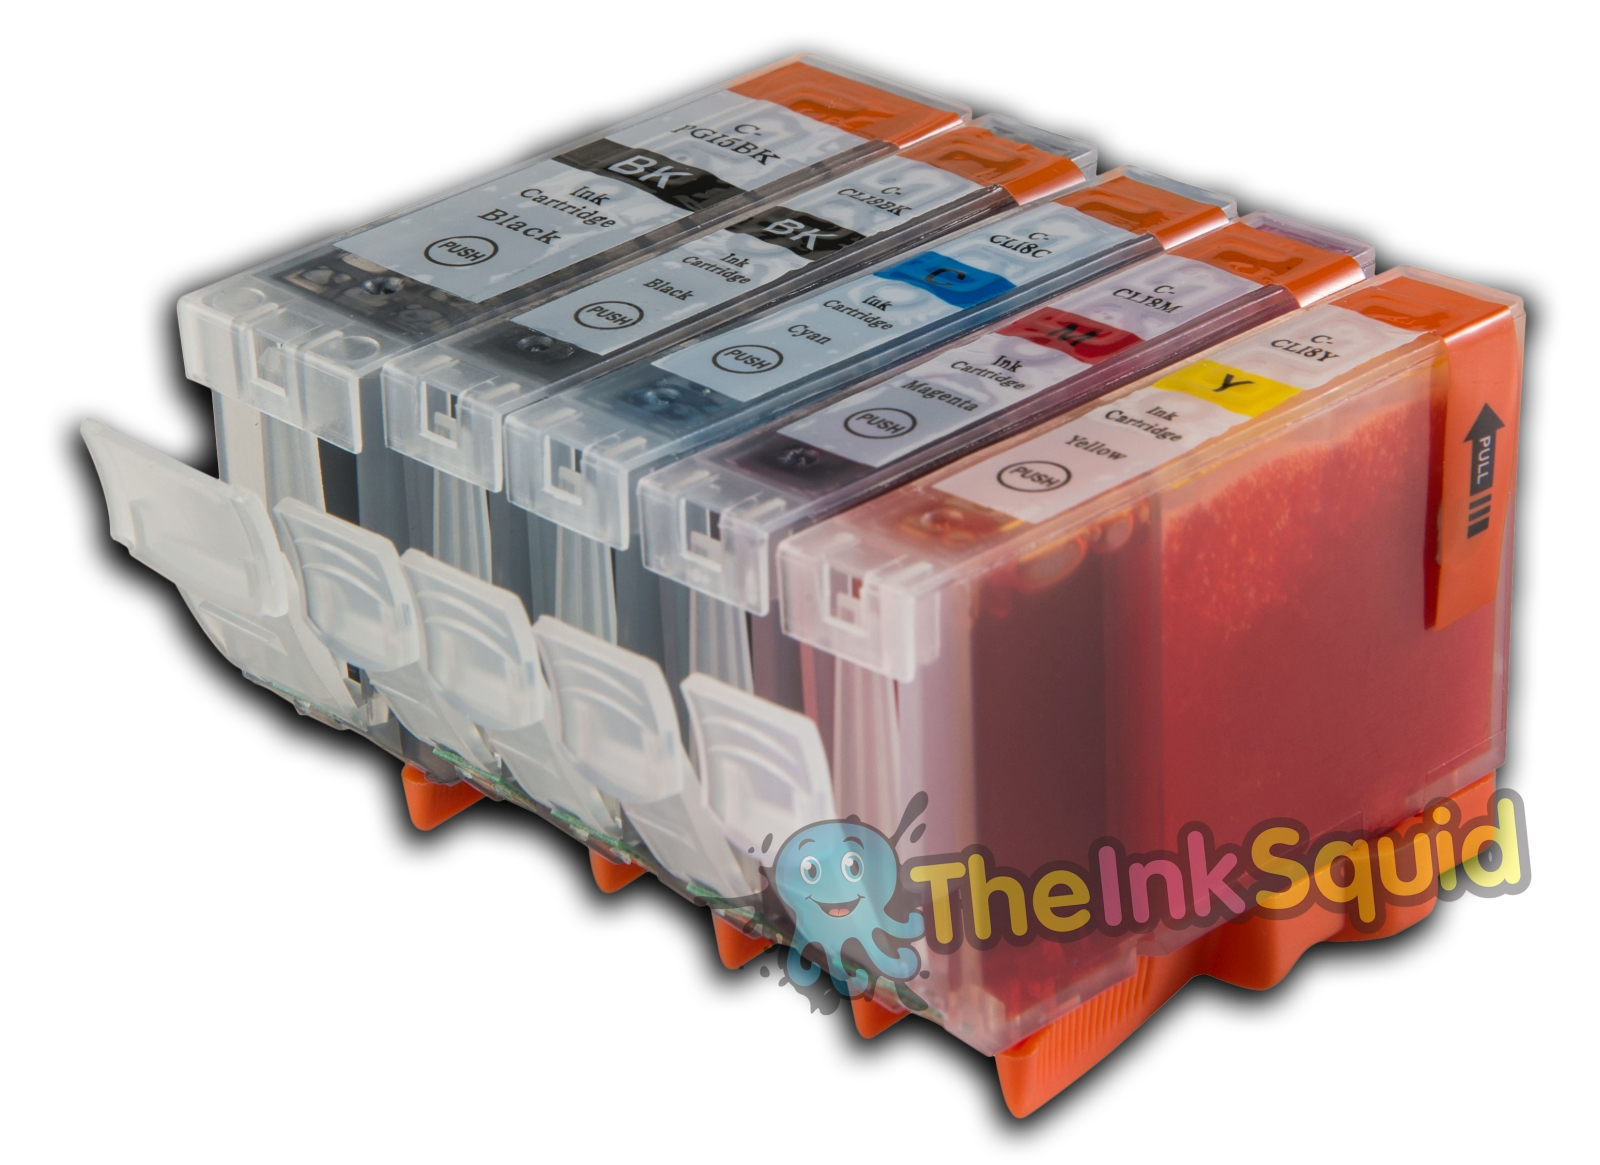 5-Compatible-Canon-Pixma-Printer-Ink-Cartridges-1-000s-sold-European-versions